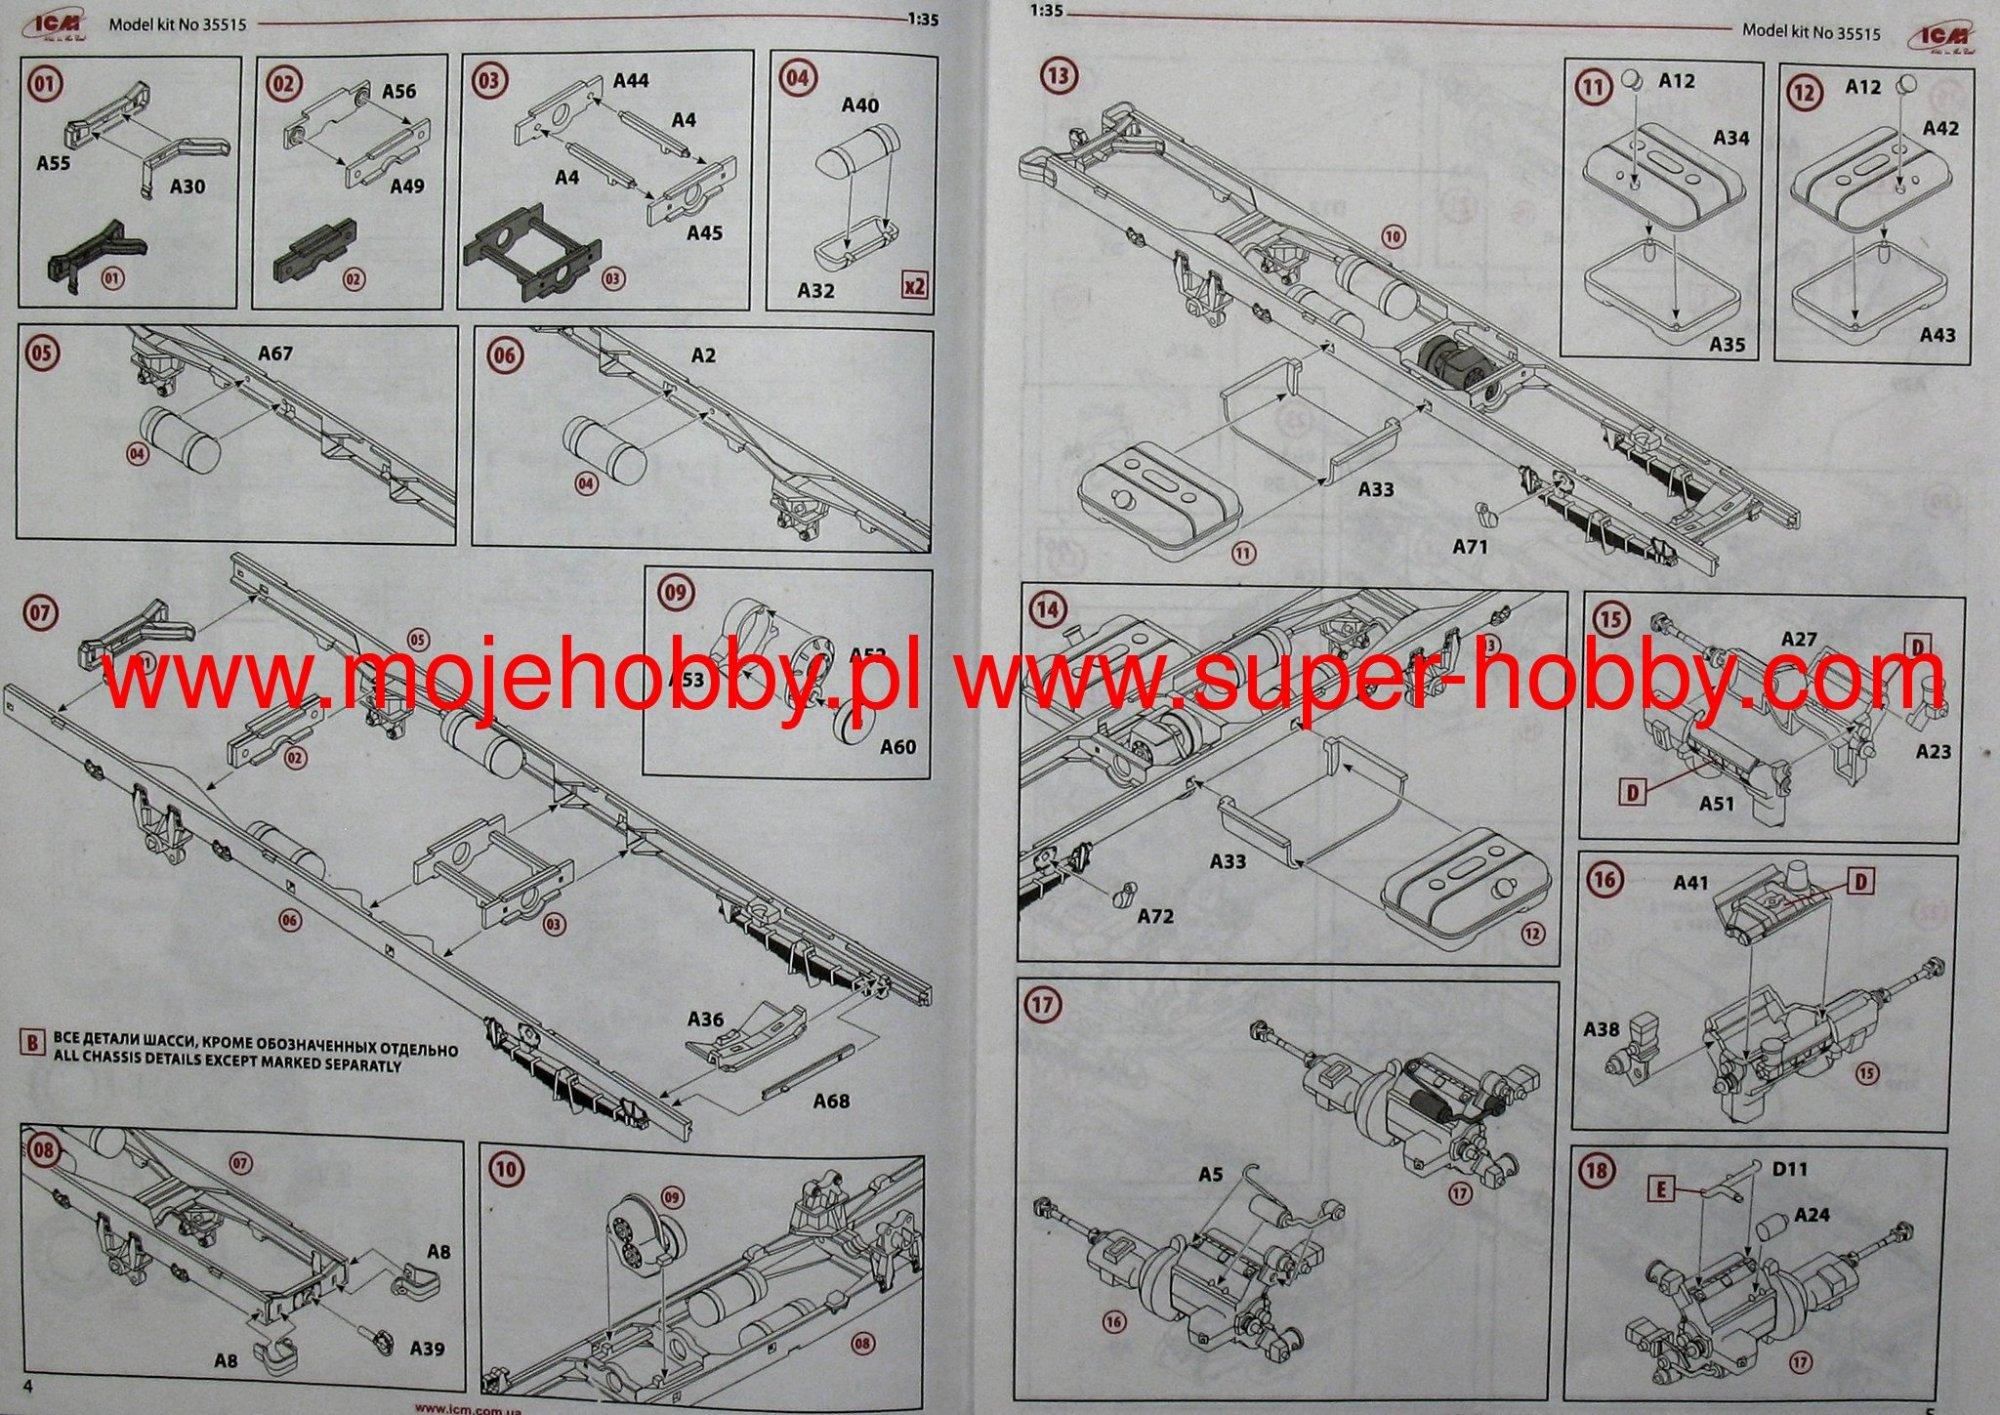 hight resolution of icm 251 wiring diagram wiring library isb wiring diagram icm 251 wiring diagram source icm timer